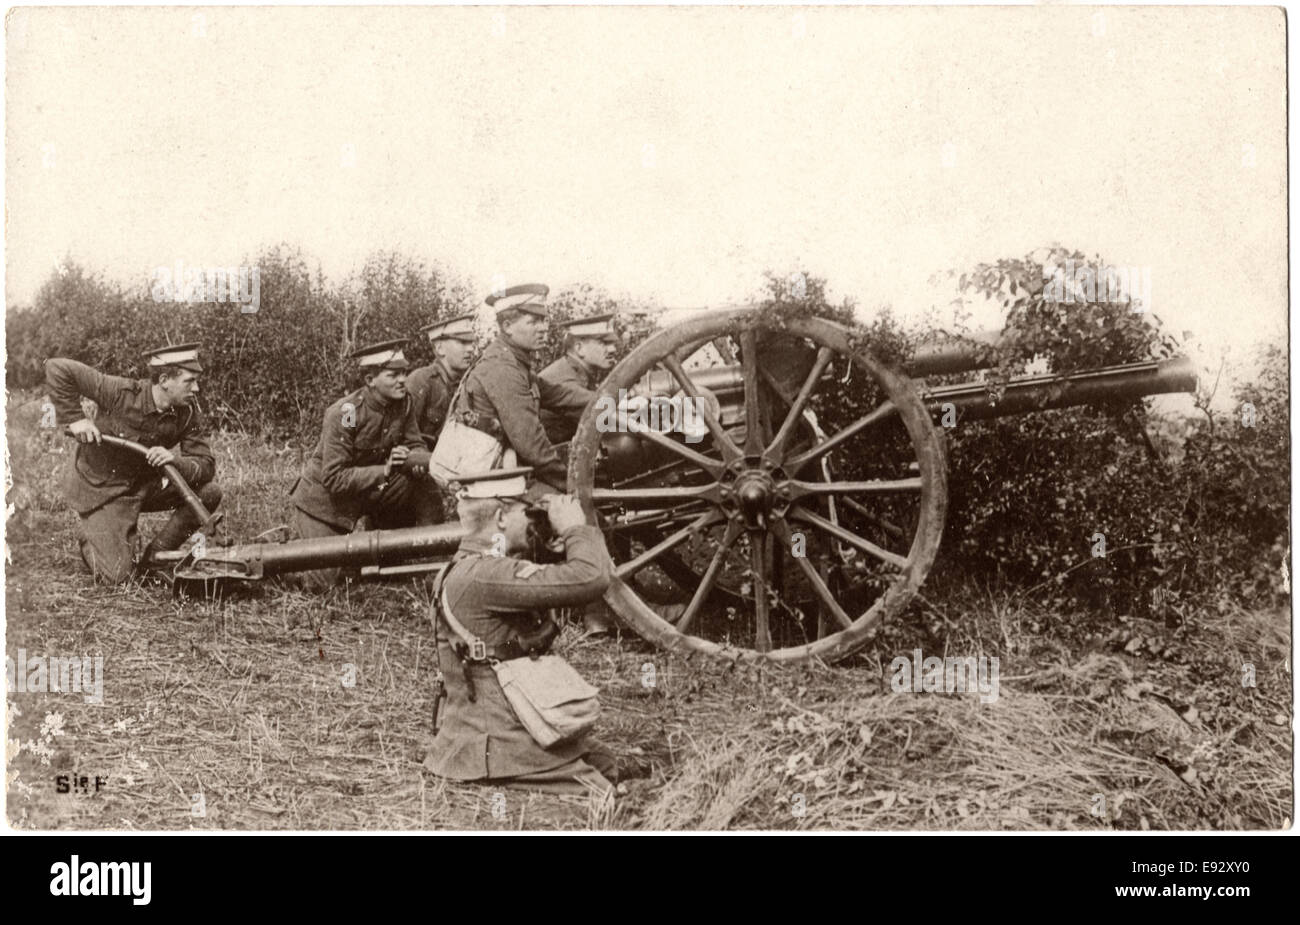 British Artillery in Action, WWI Postcard, circa 1914 - Stock Image